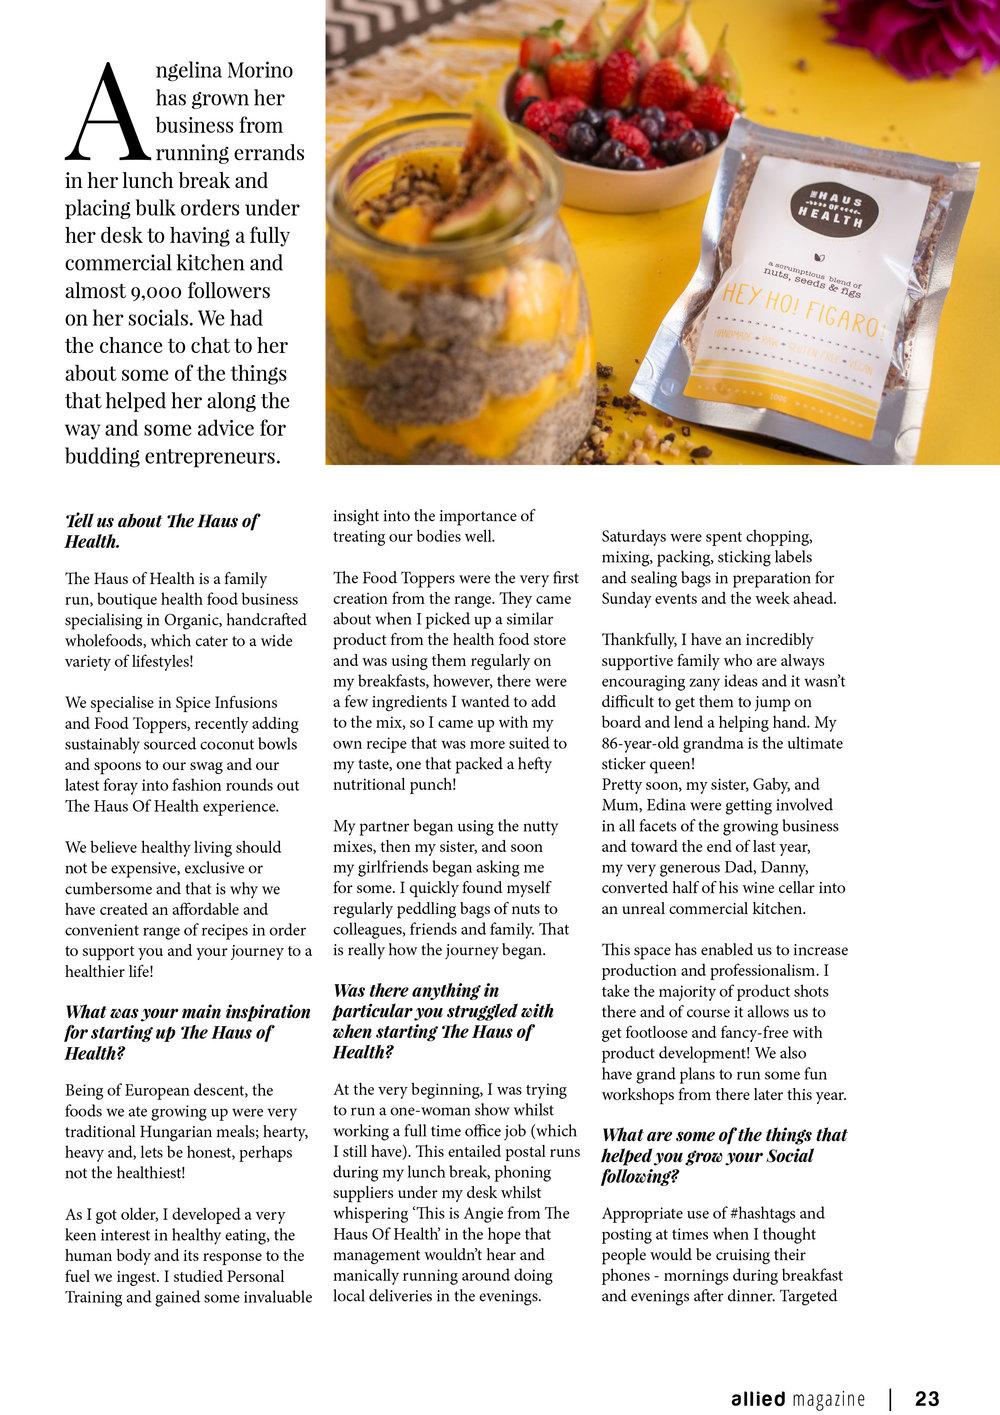 Haus of Health - Allied Magazine Article-2.jpg